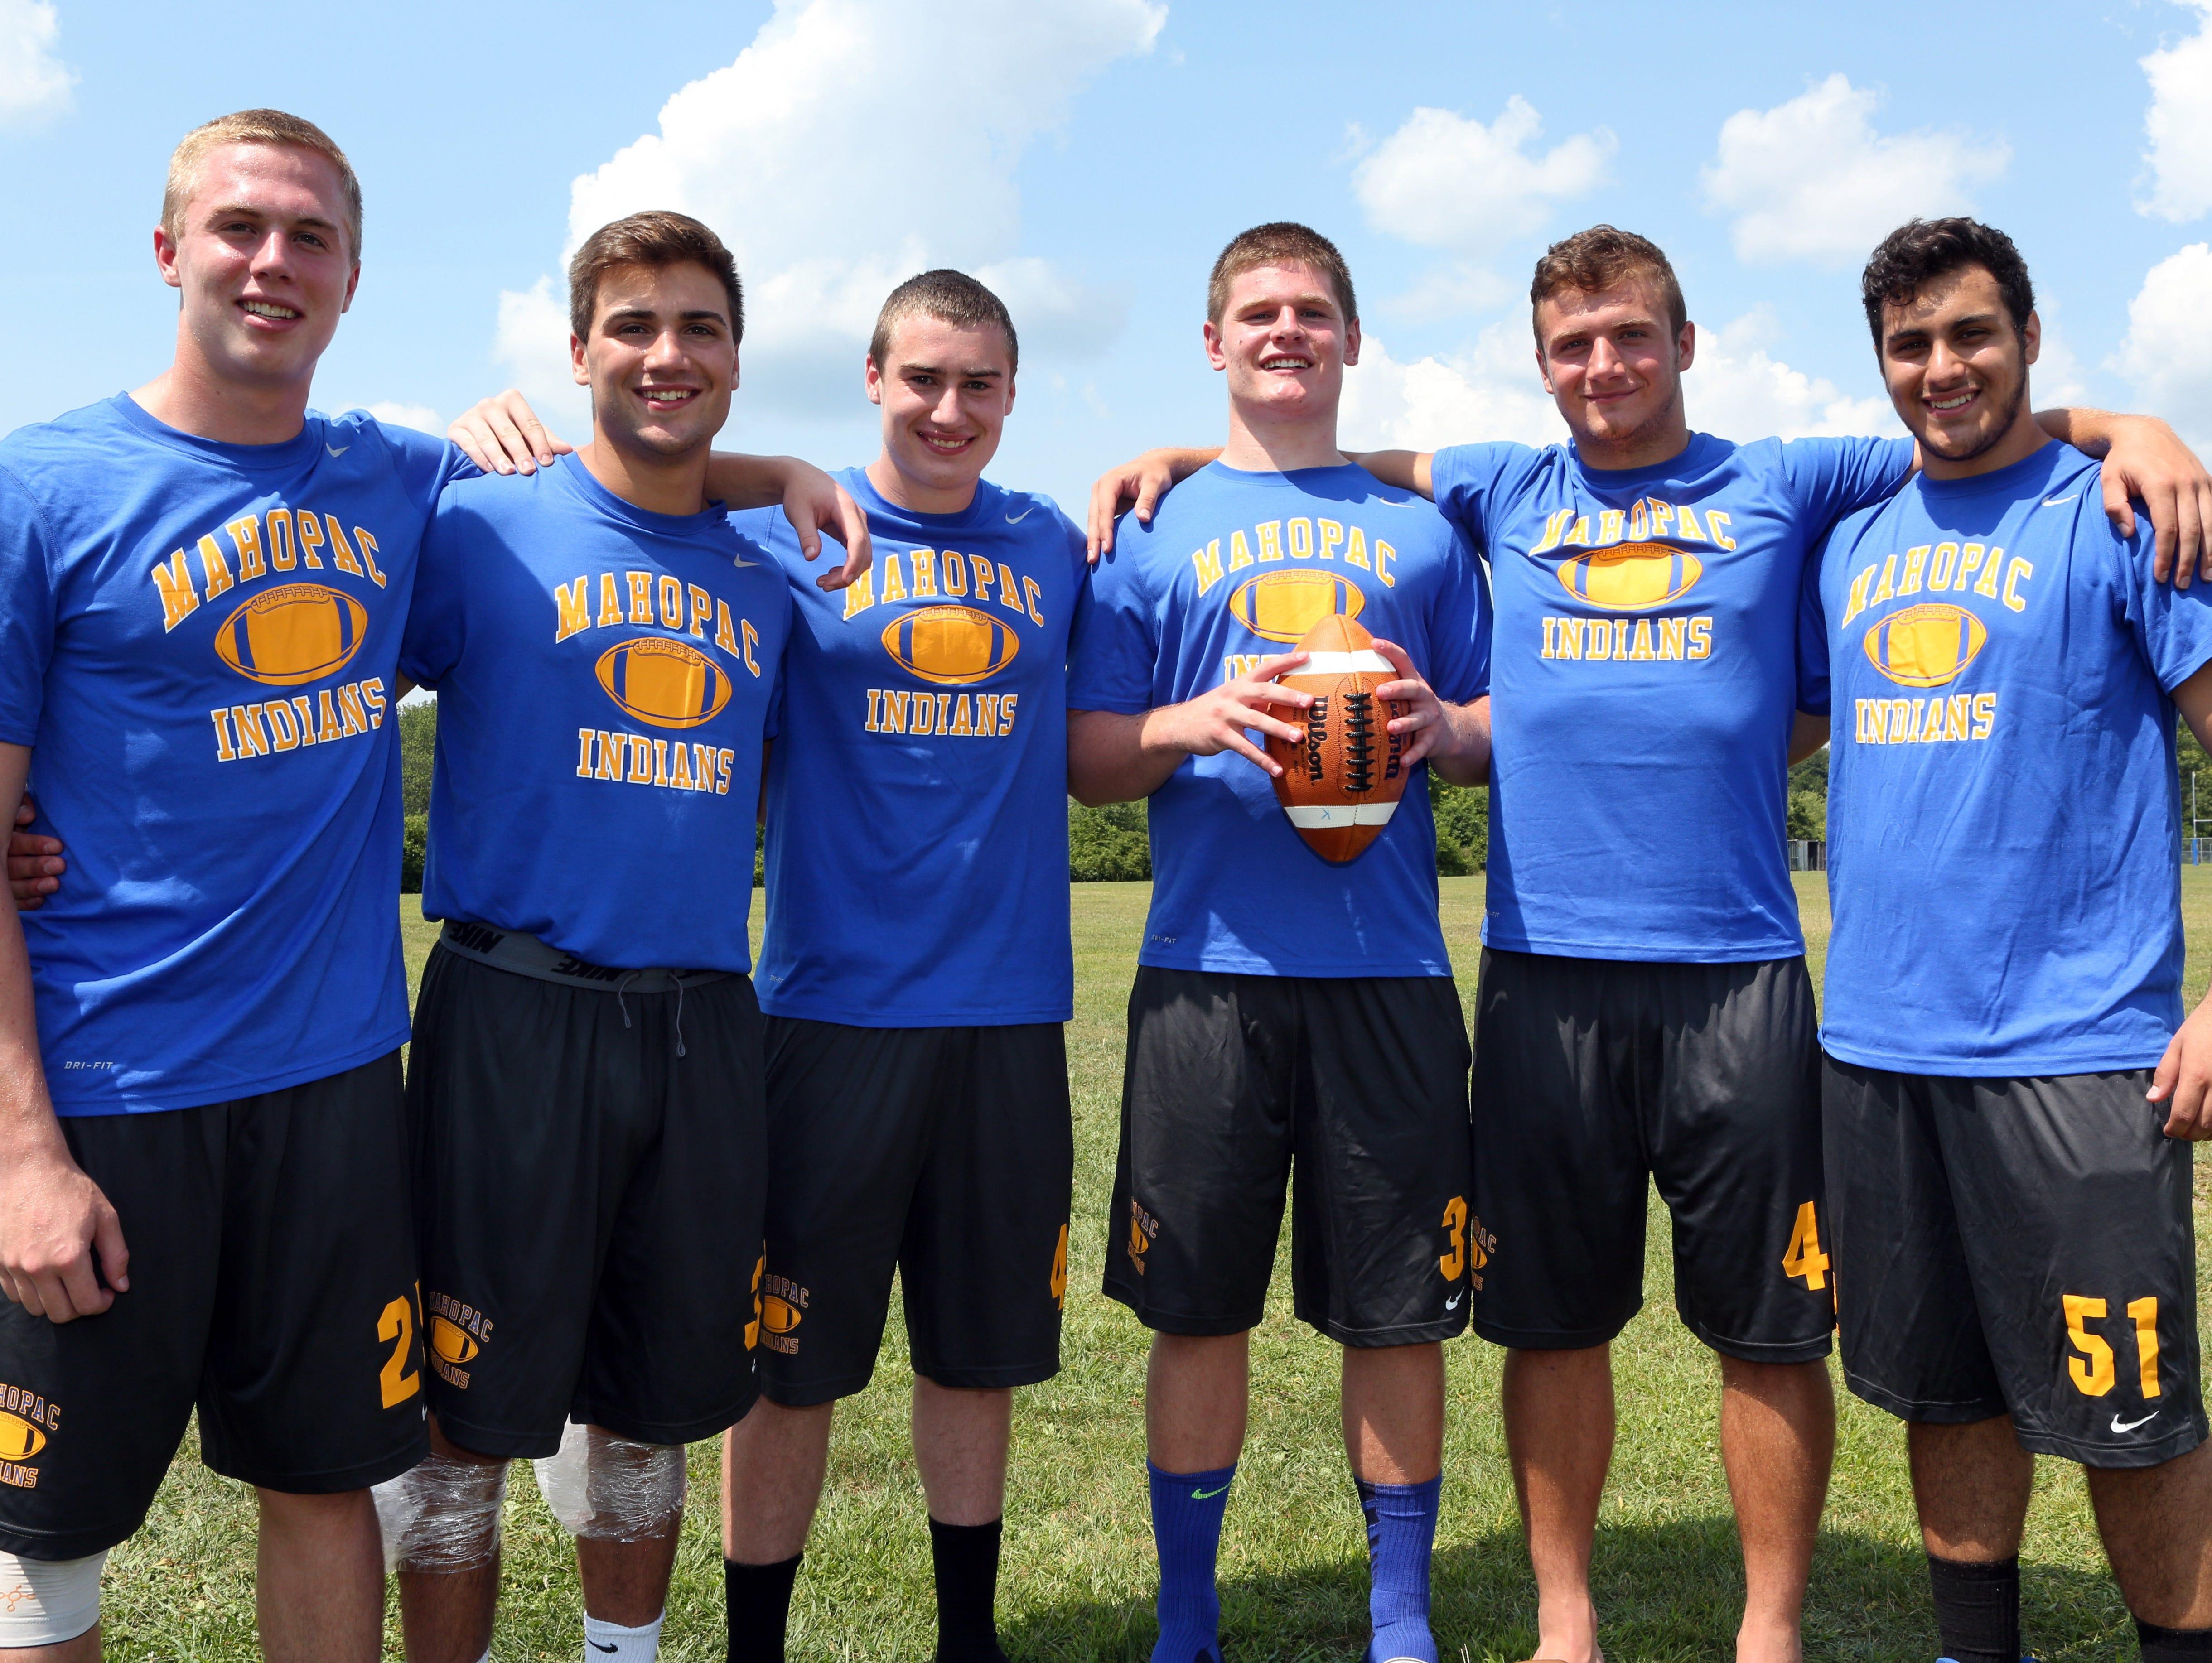 Mahopac varsity football players from left, Christian Donahoe, Joseph Cavaciuti, Tom Murray, Dan Foley, Chris Kocovic and Mike Paolello pose at Mahopac High School Aug. 17, 2015.